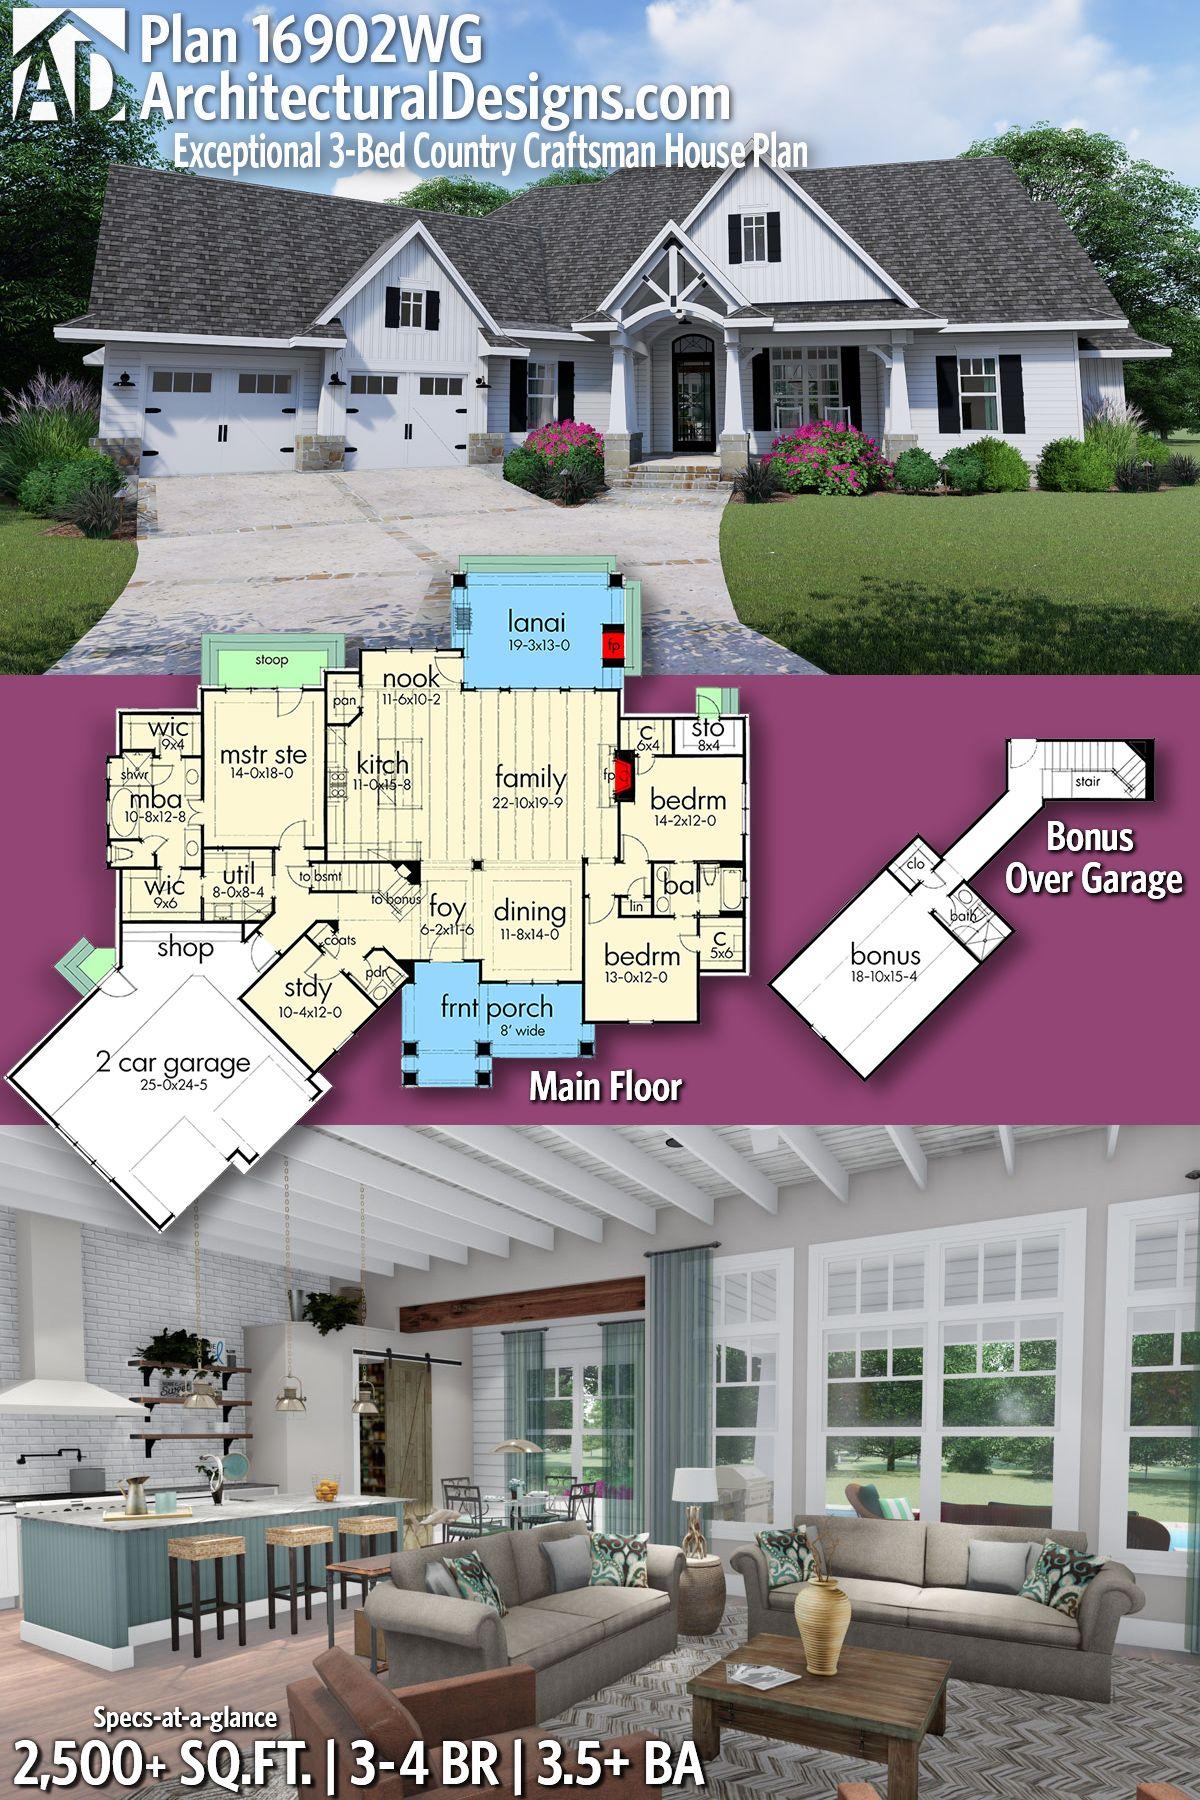 Architectural Designs Craftsman House Plan 16902WG 3